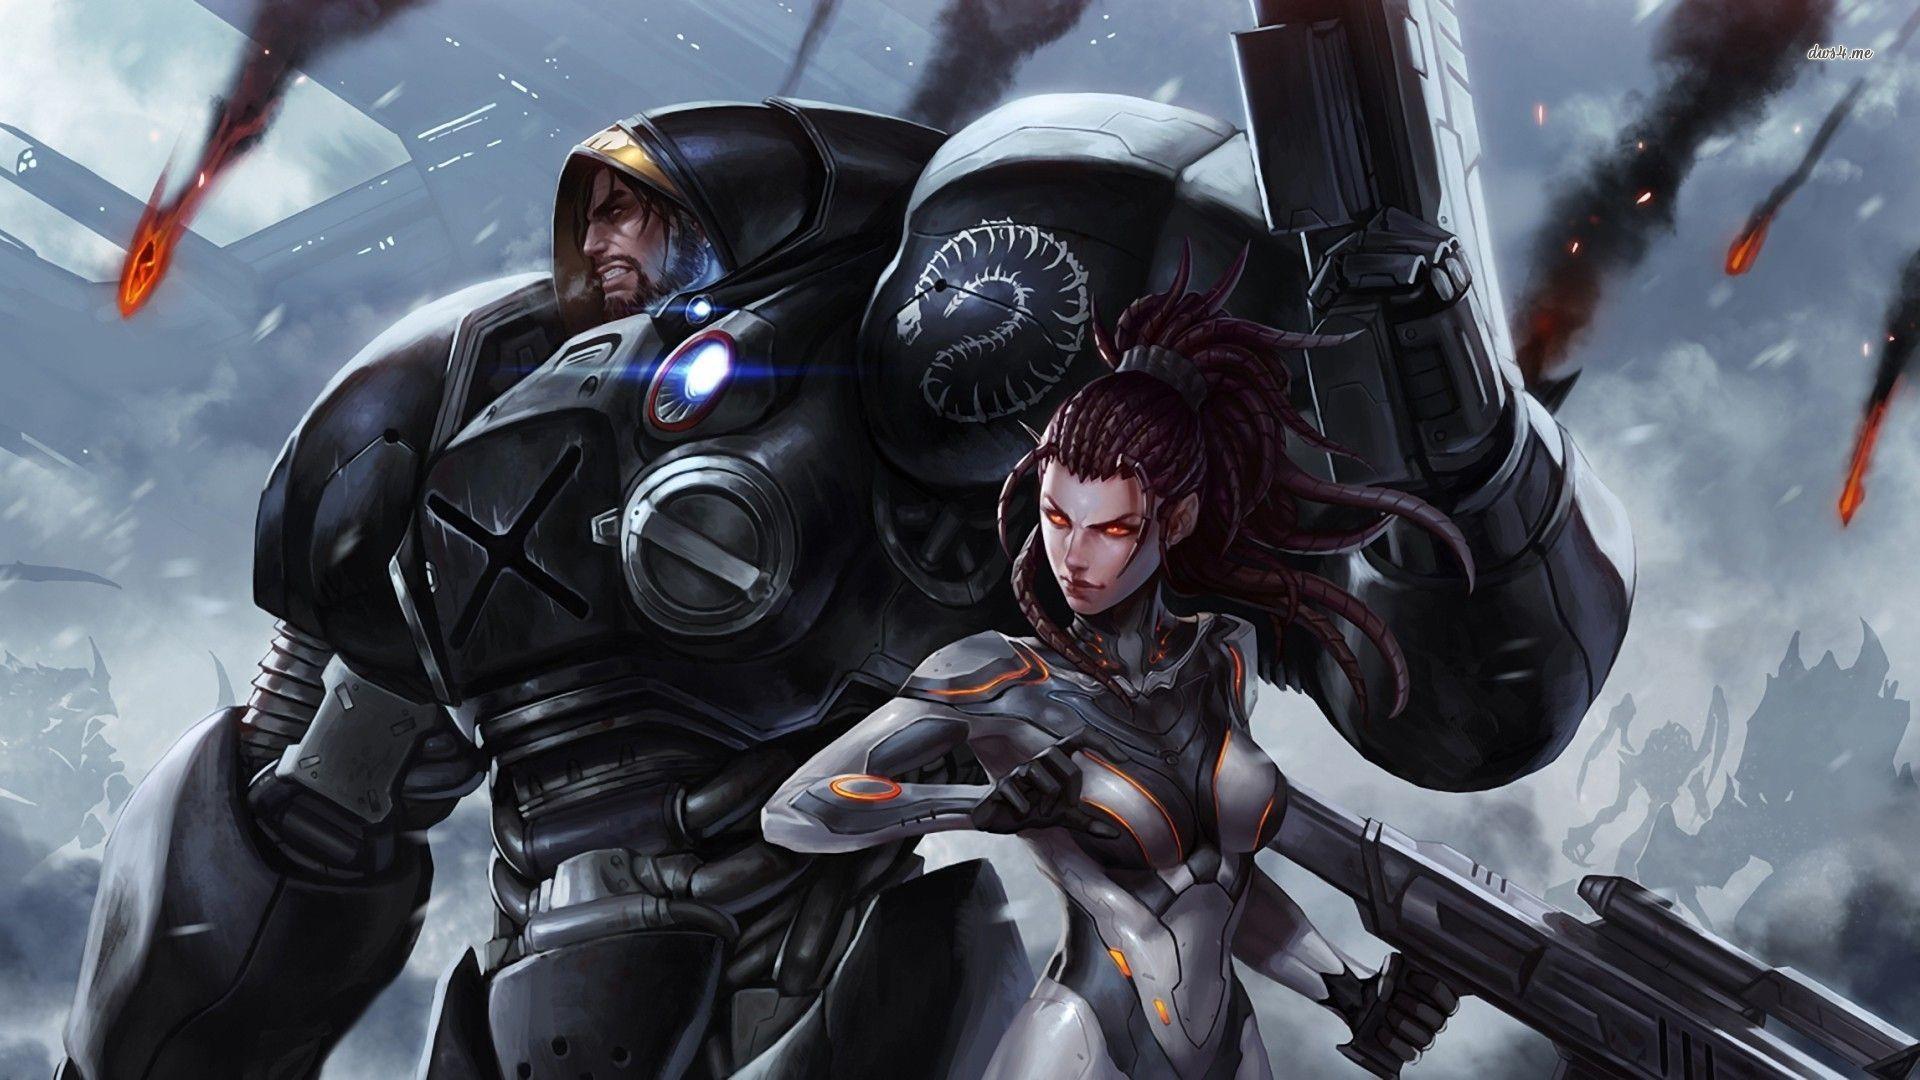 Res: 1920x1080, ... StarCraft II wallpaper  ...